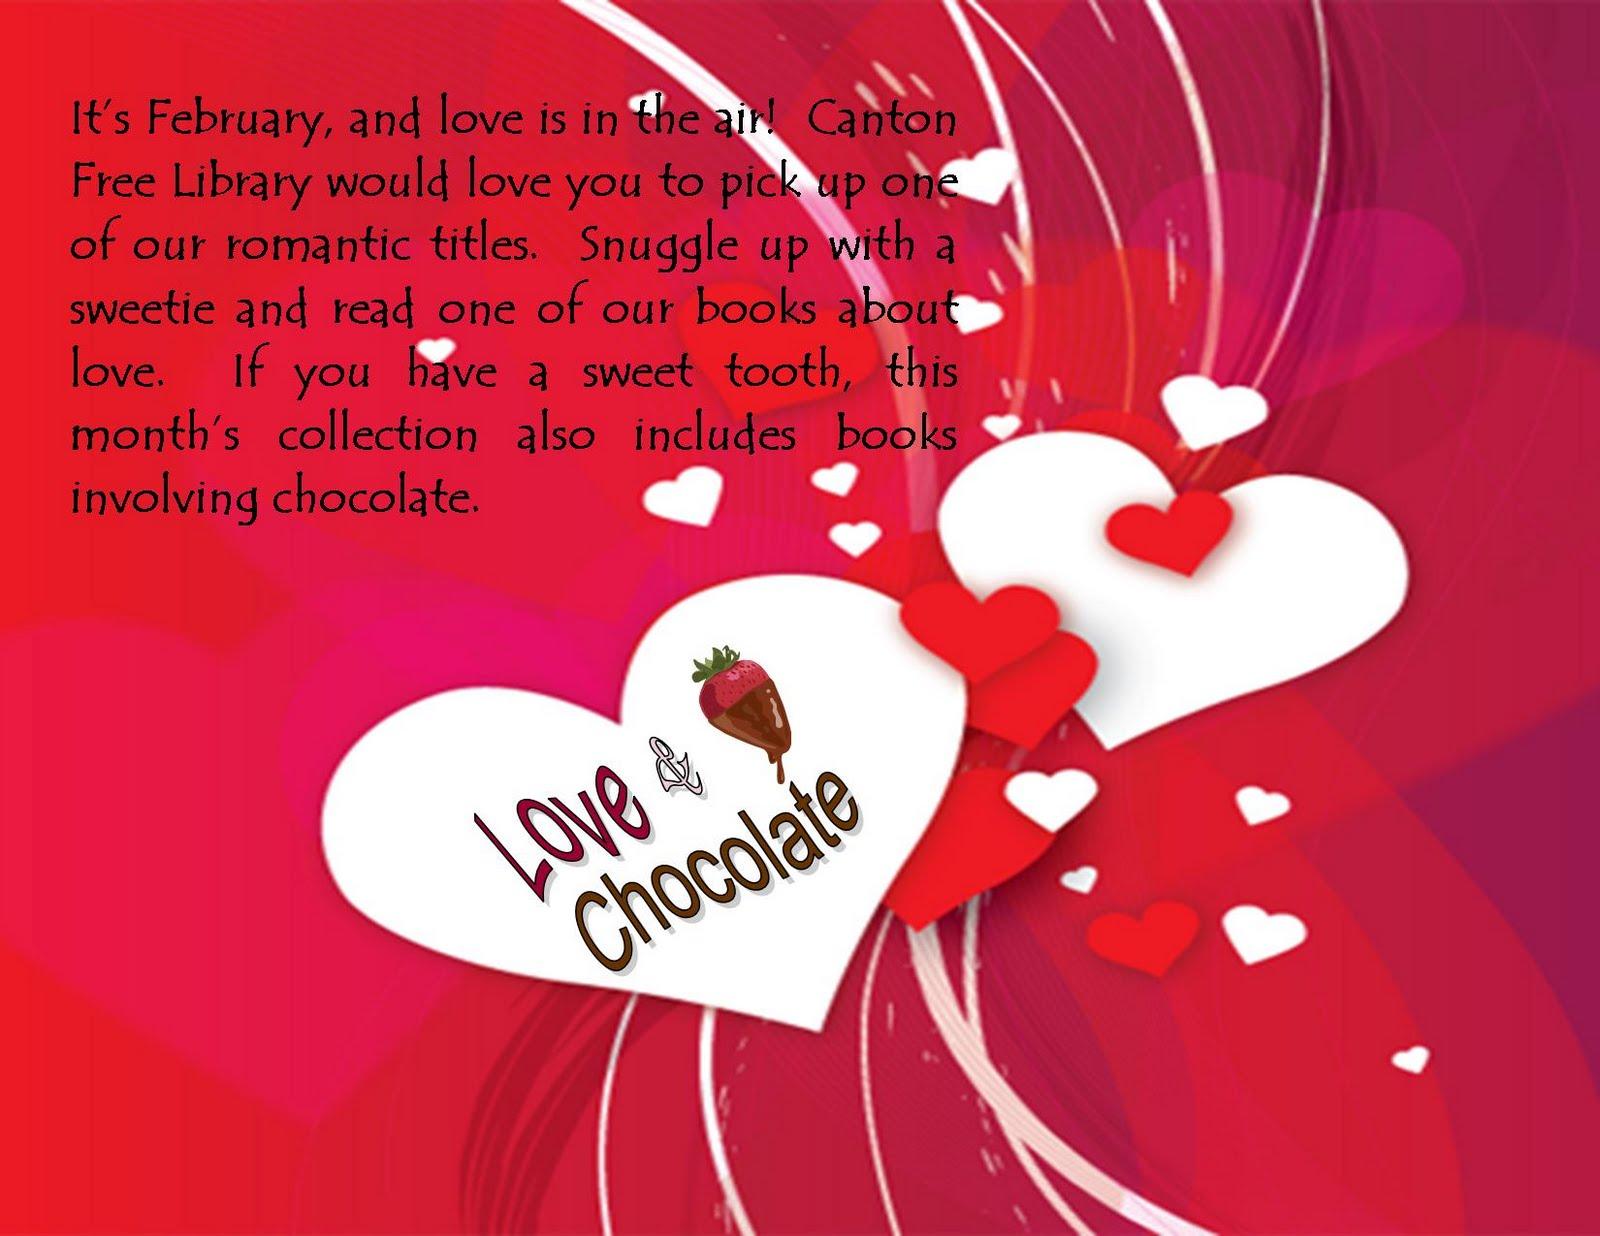 http://1.bp.blogspot.com/_X0JOD3TGncc/TUhA6L5CudI/AAAAAAAAASE/0pwfzI4rEIM/s1600/Loveandchocolate.jpg